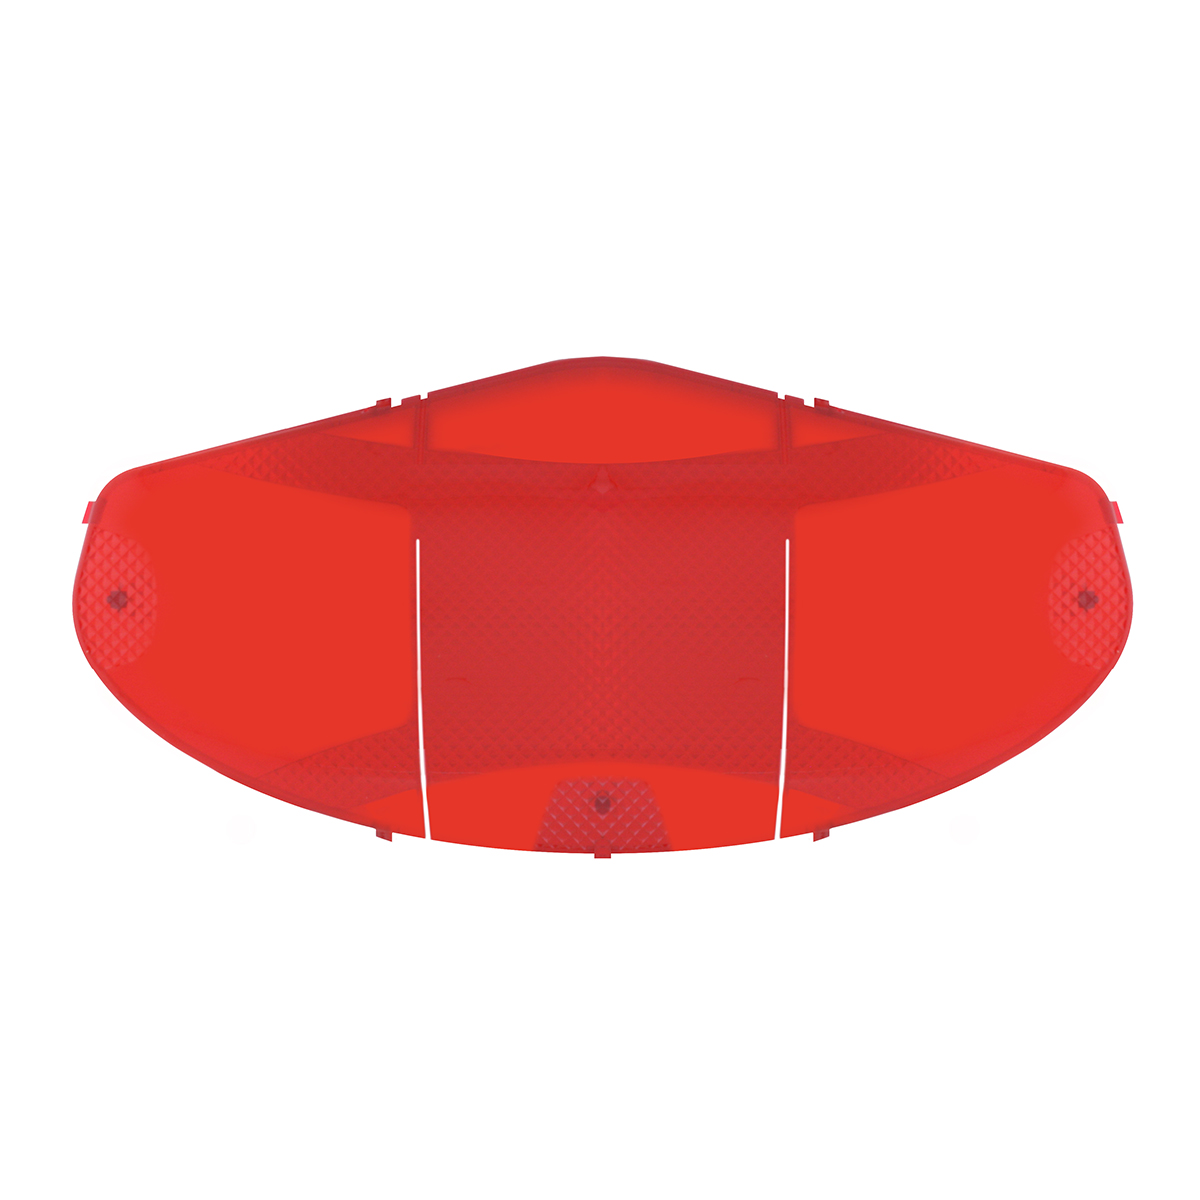 67775 Small Dome Light Lens for Freightliner Cascadia